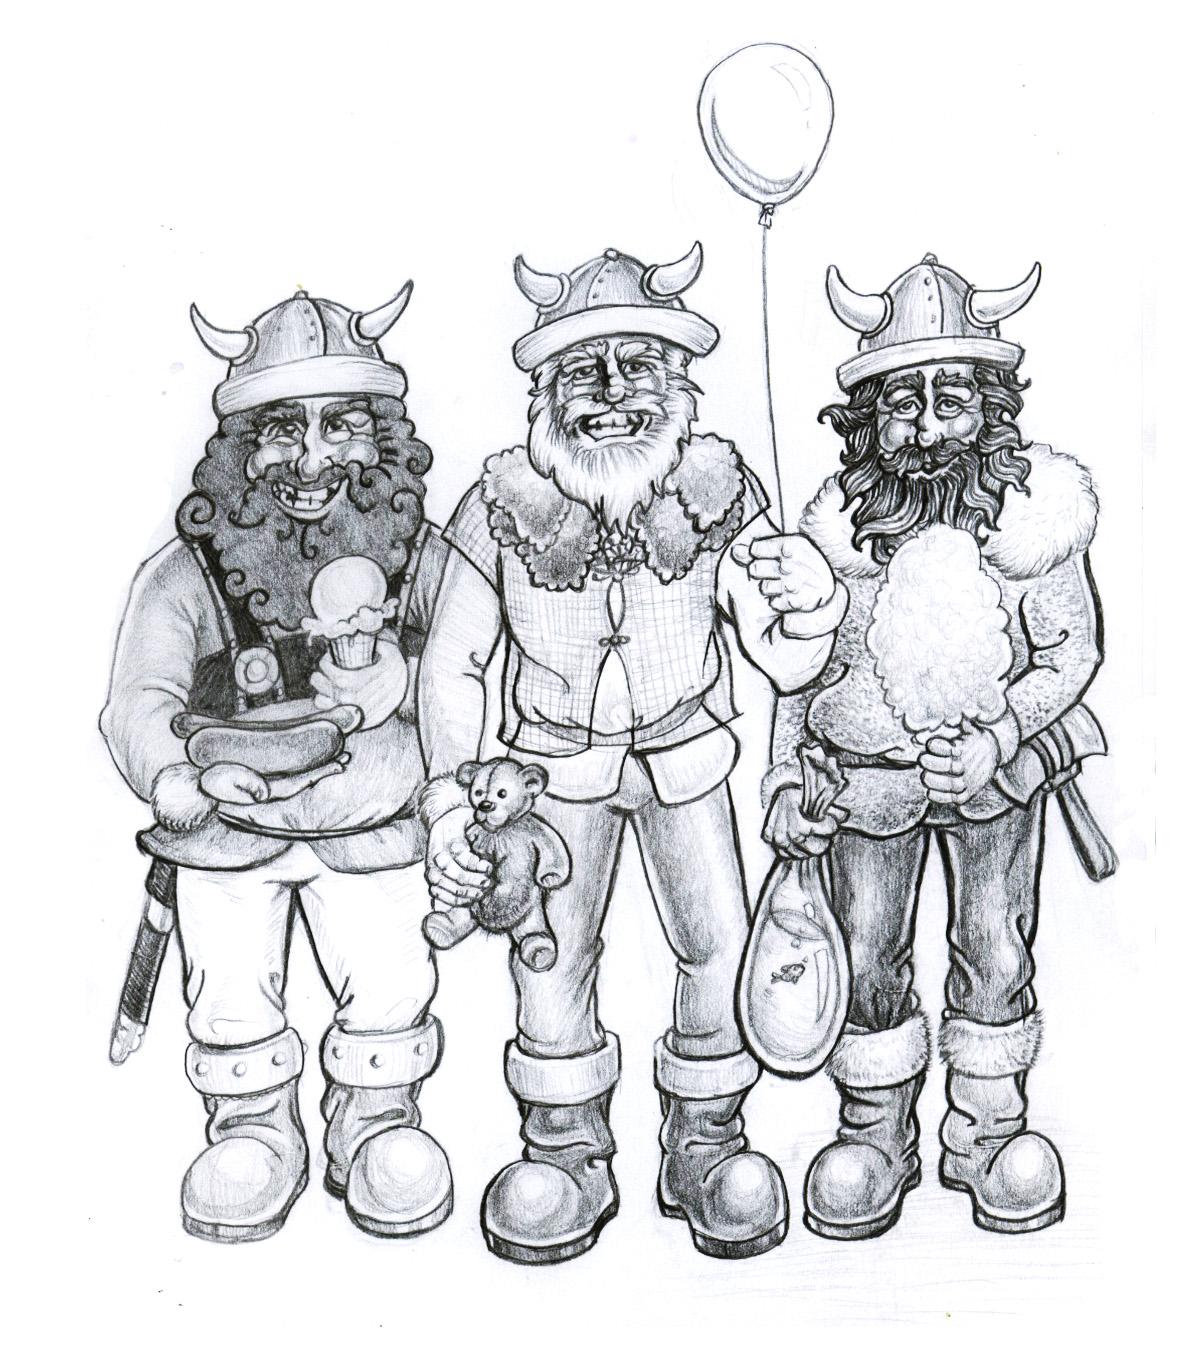 """Vikingfest Illustration""  Pencil on Paper"